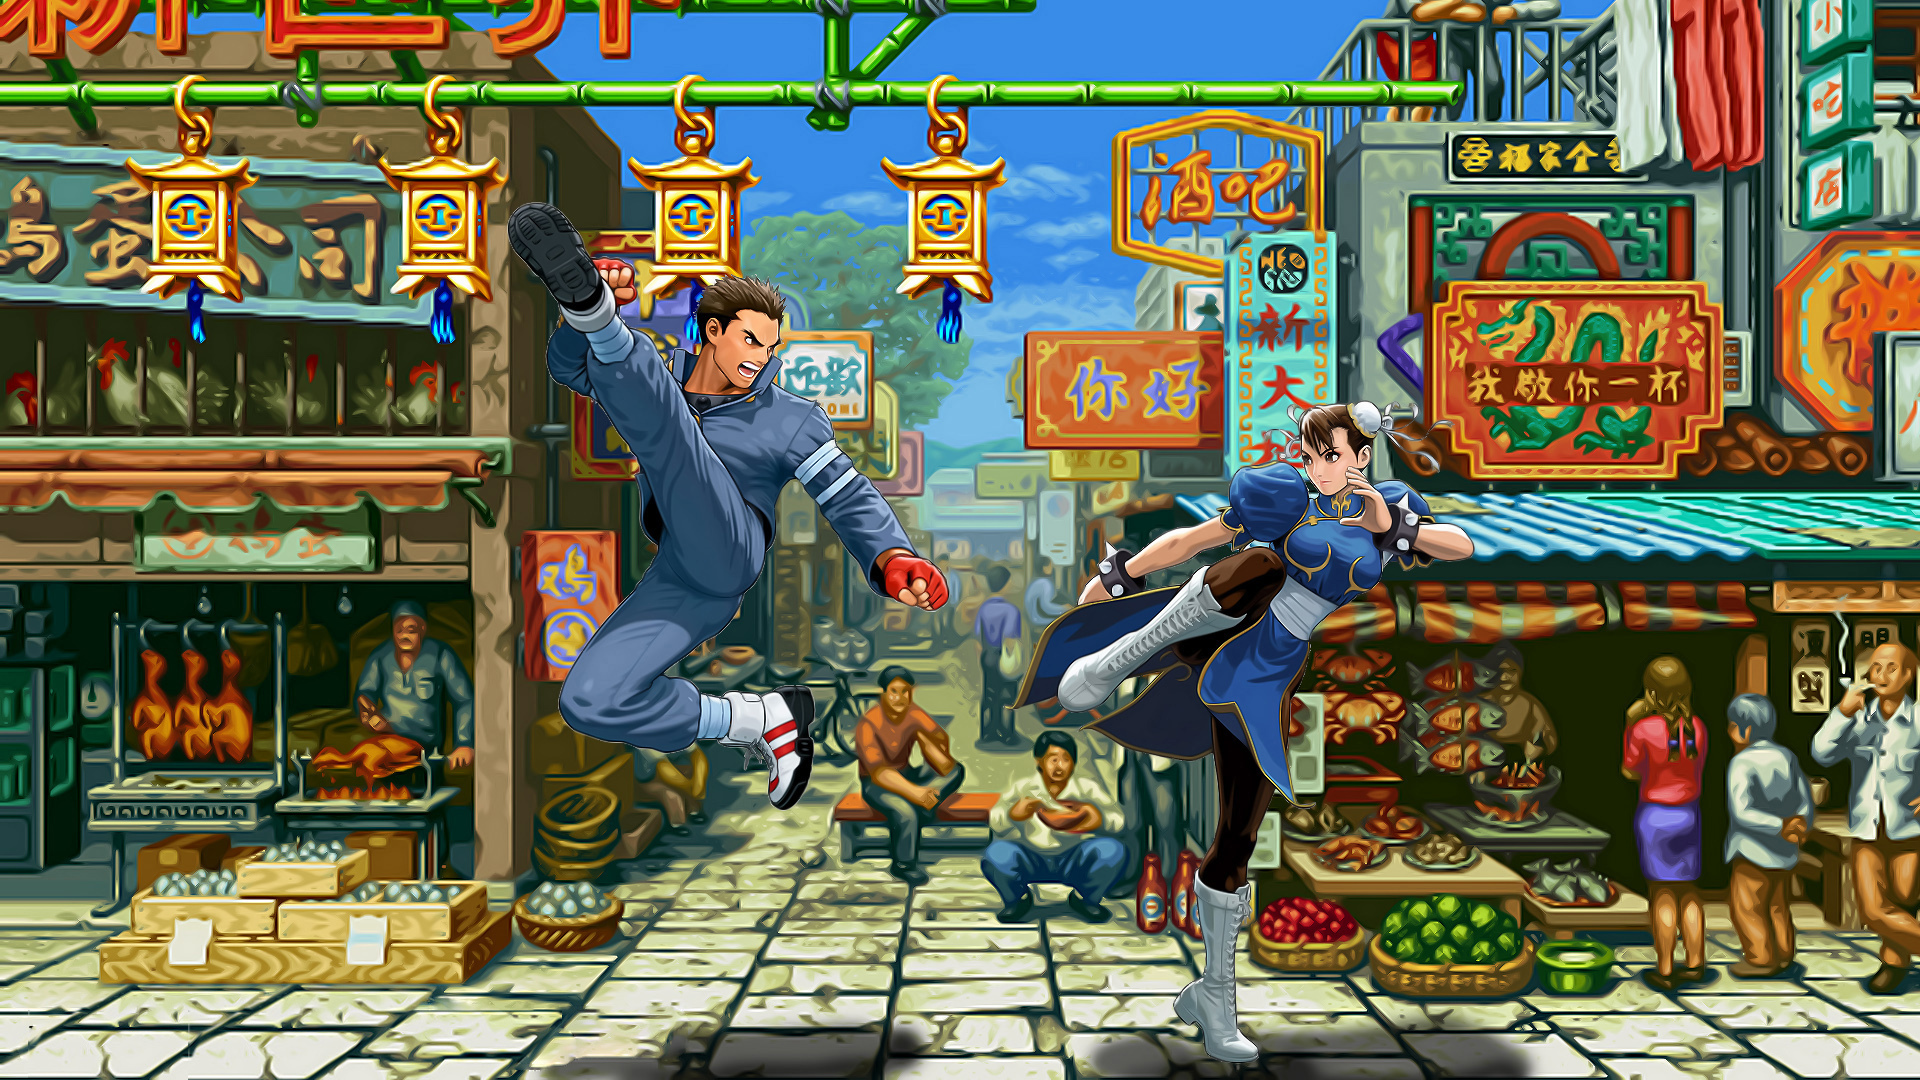 Обои Street Fighter бой на рынке